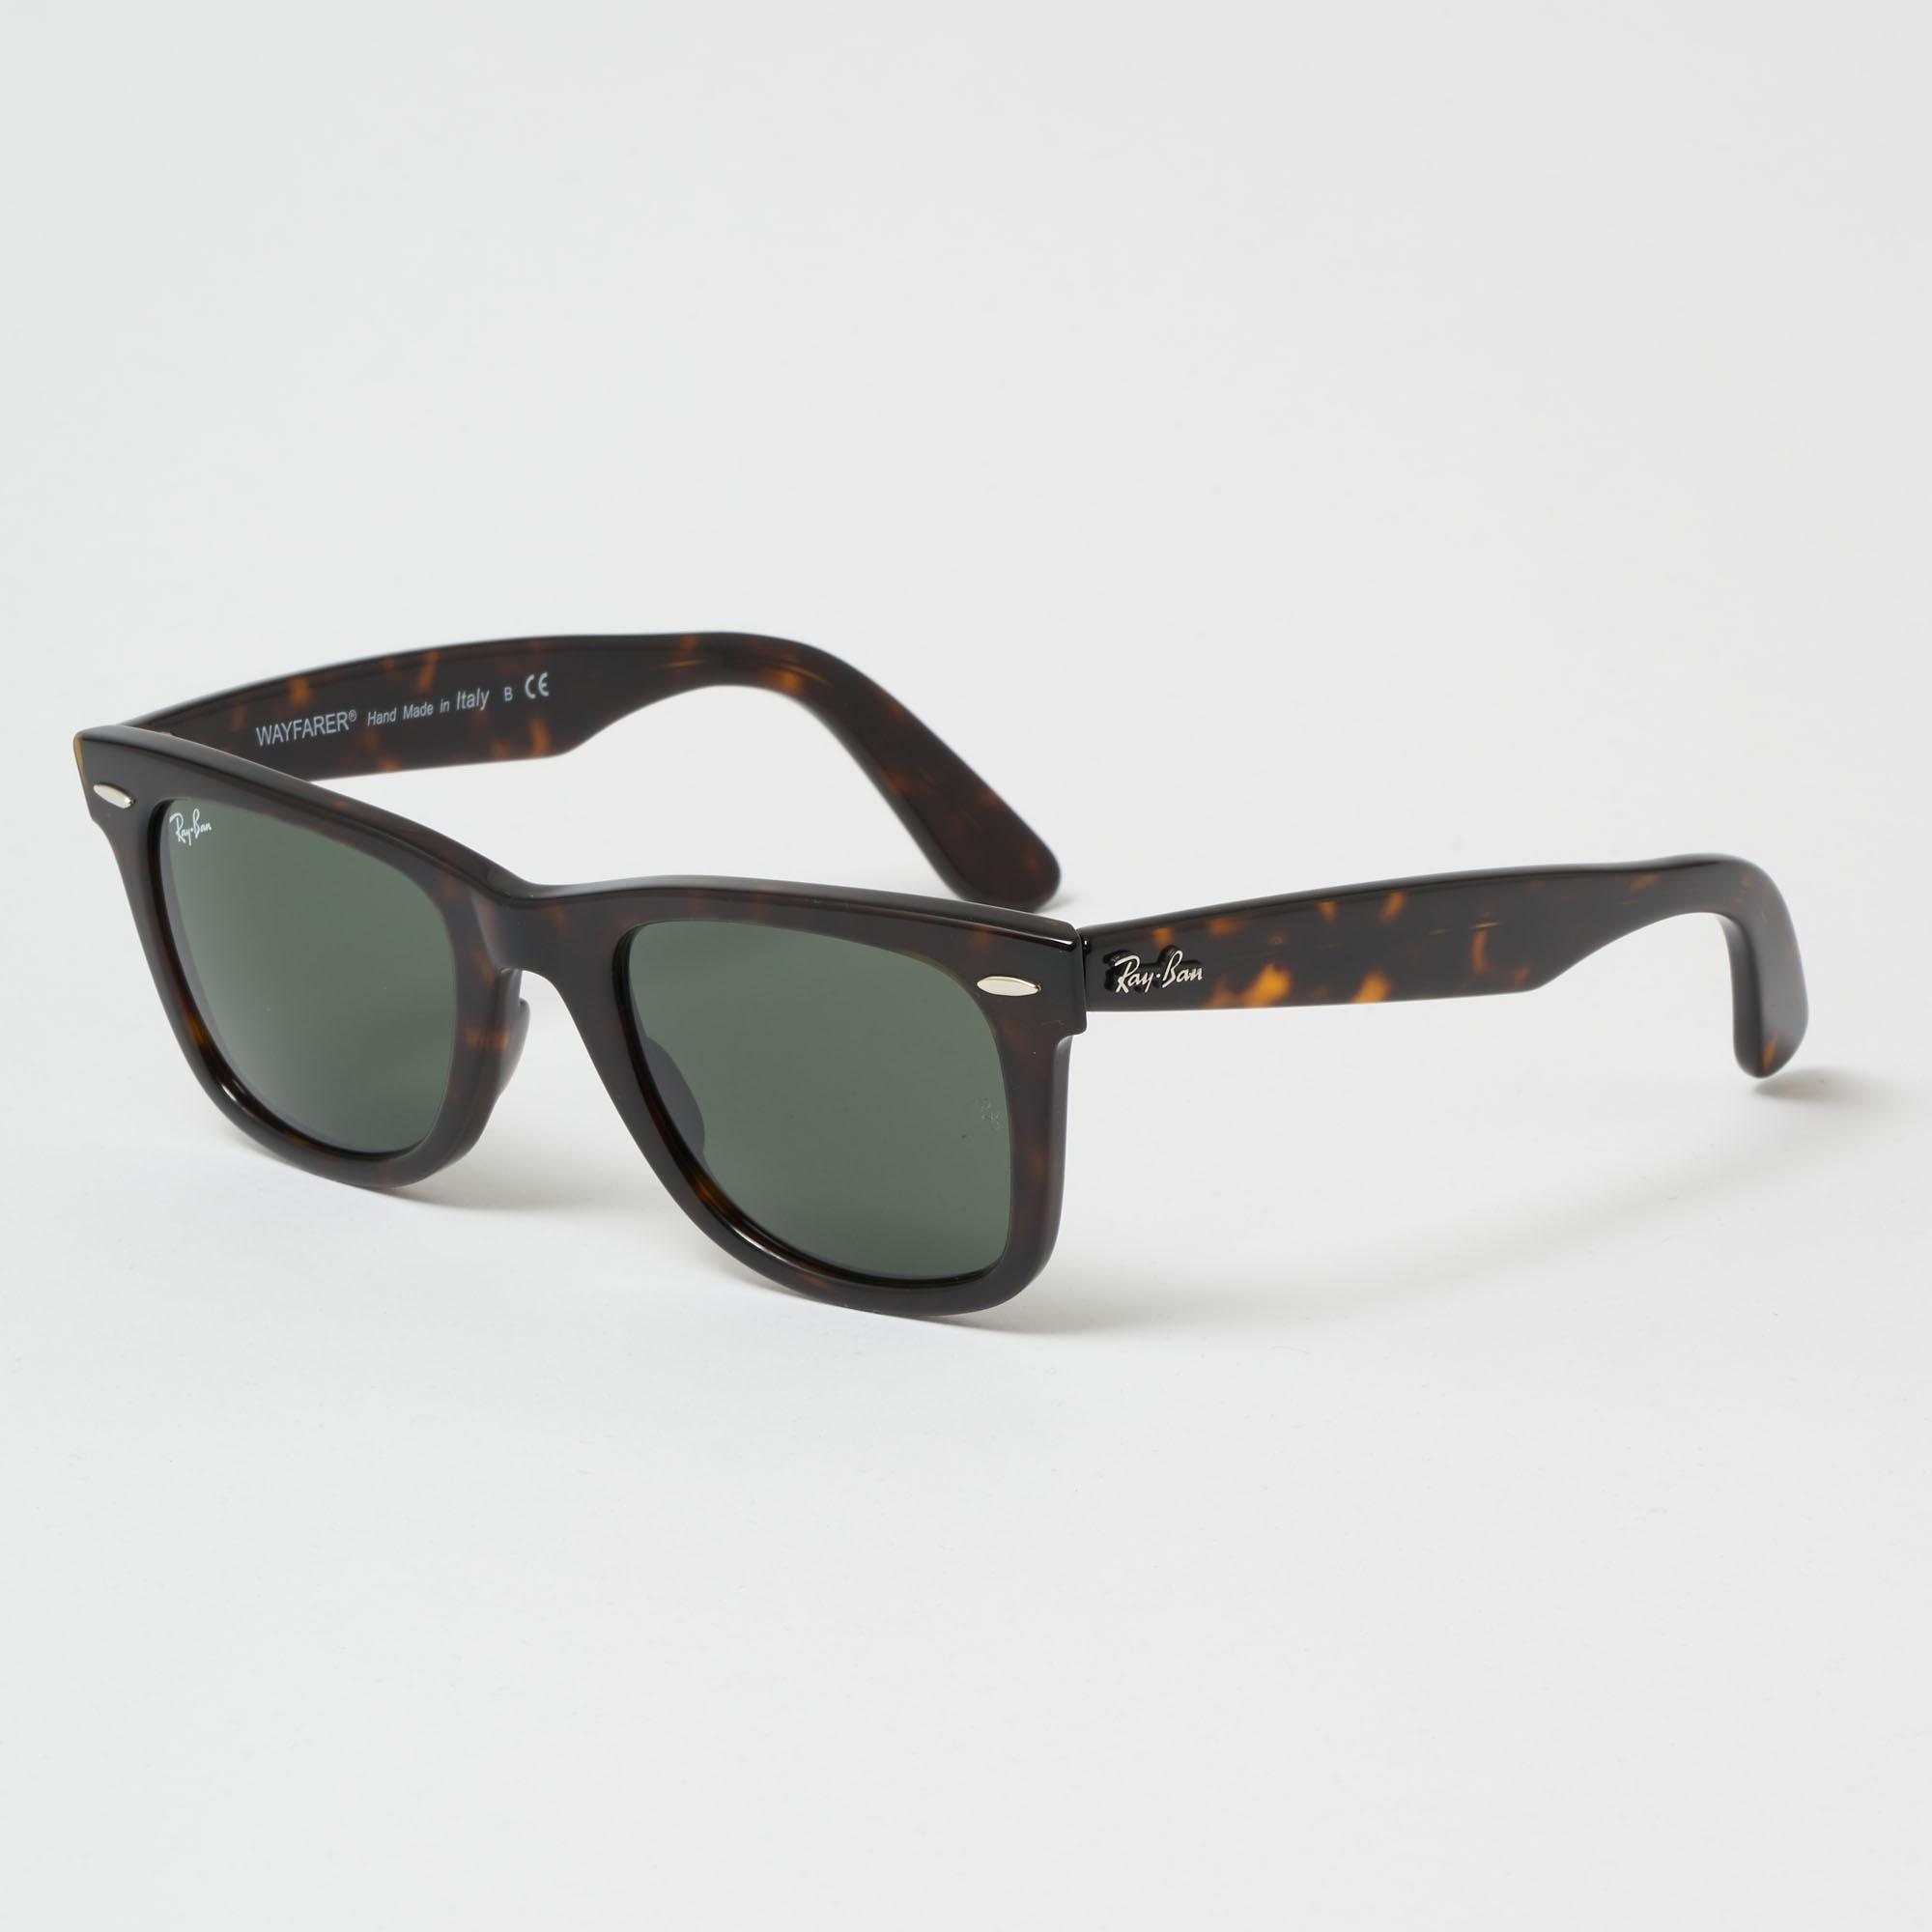 1a9ab46ce6f Lyst - Ray-Ban Original Wayfarer Classic Sunglasses - Green Classic ...